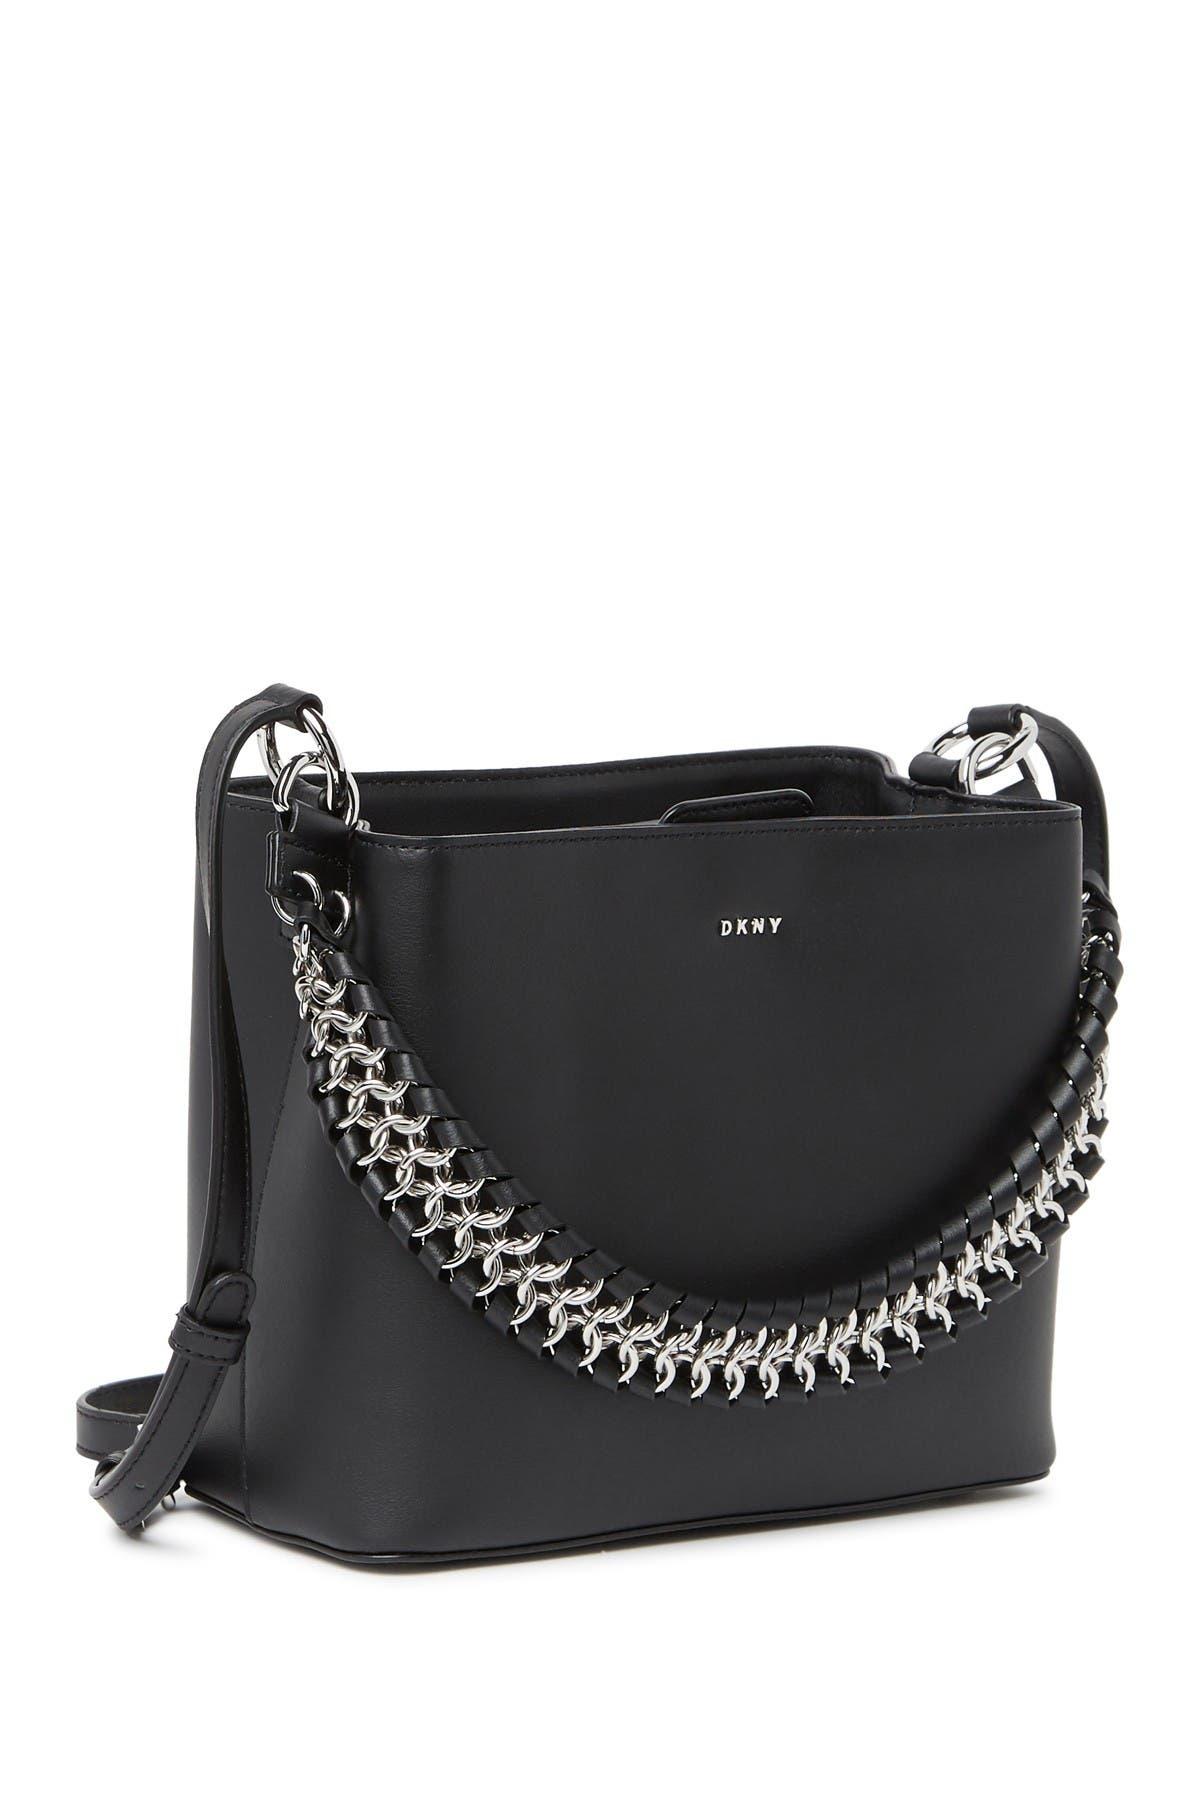 Image of DKNY Bethune Small Leather Bucket Bag